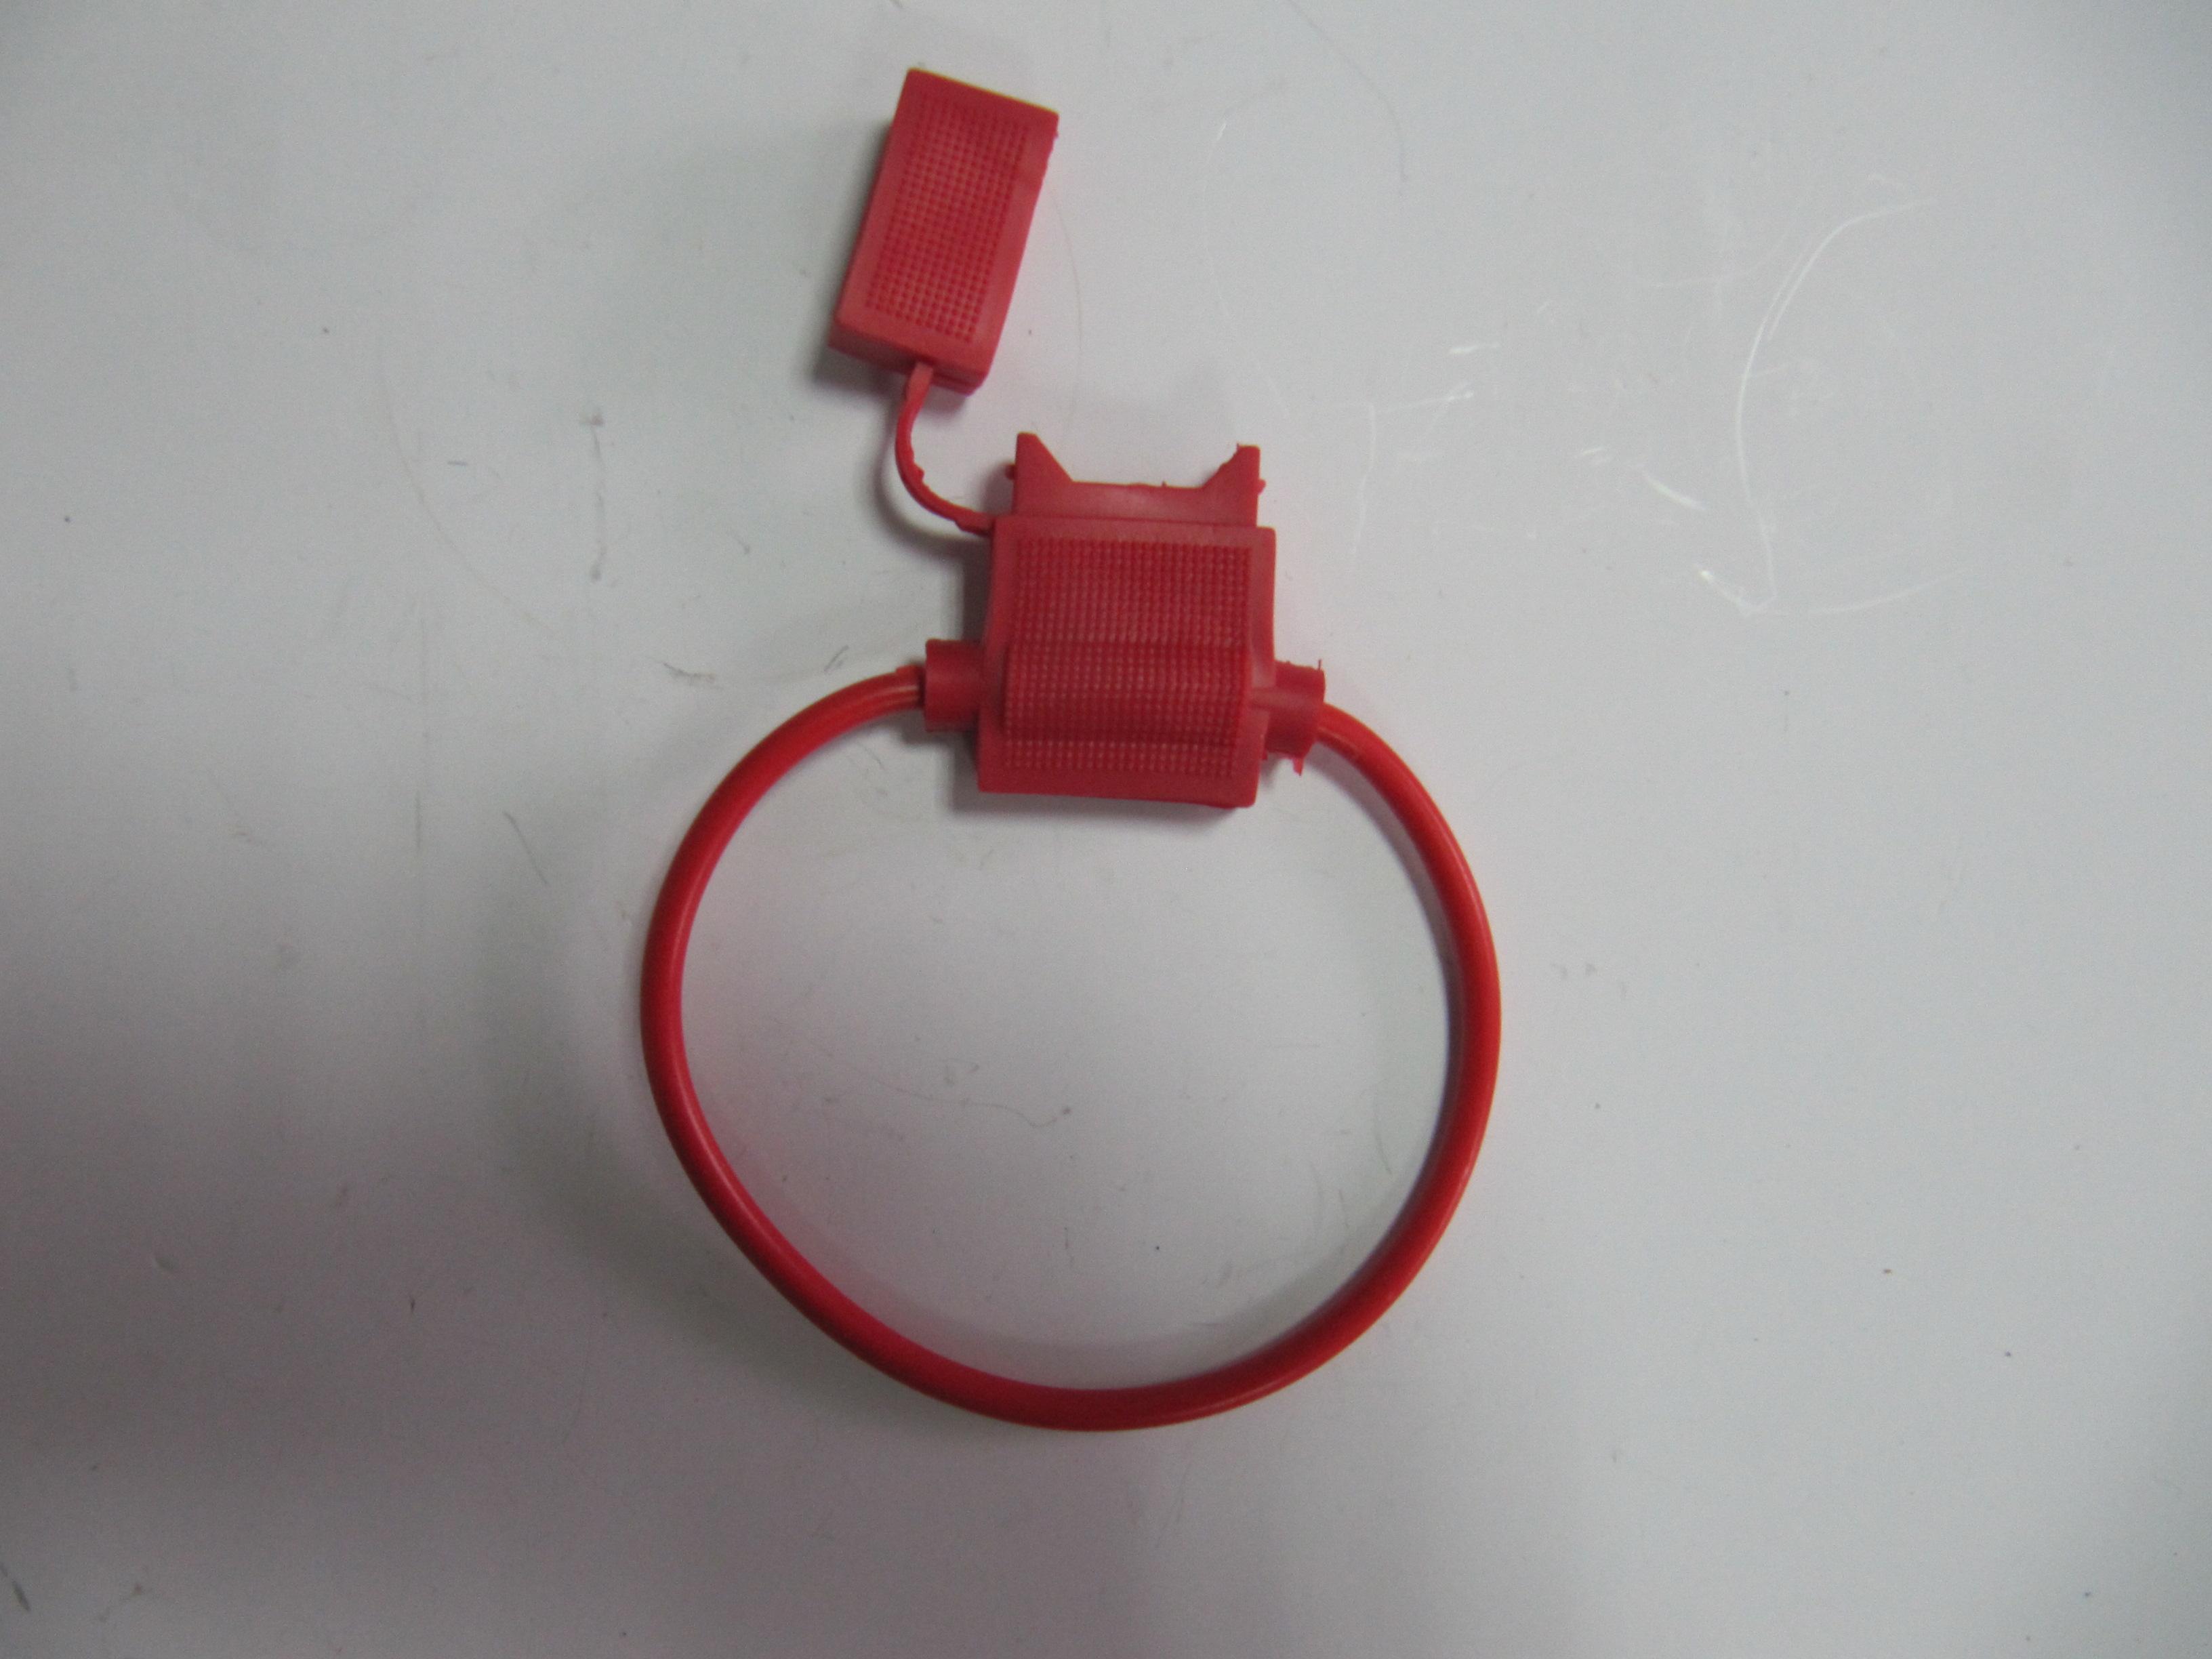 Колодка запобіжника червона